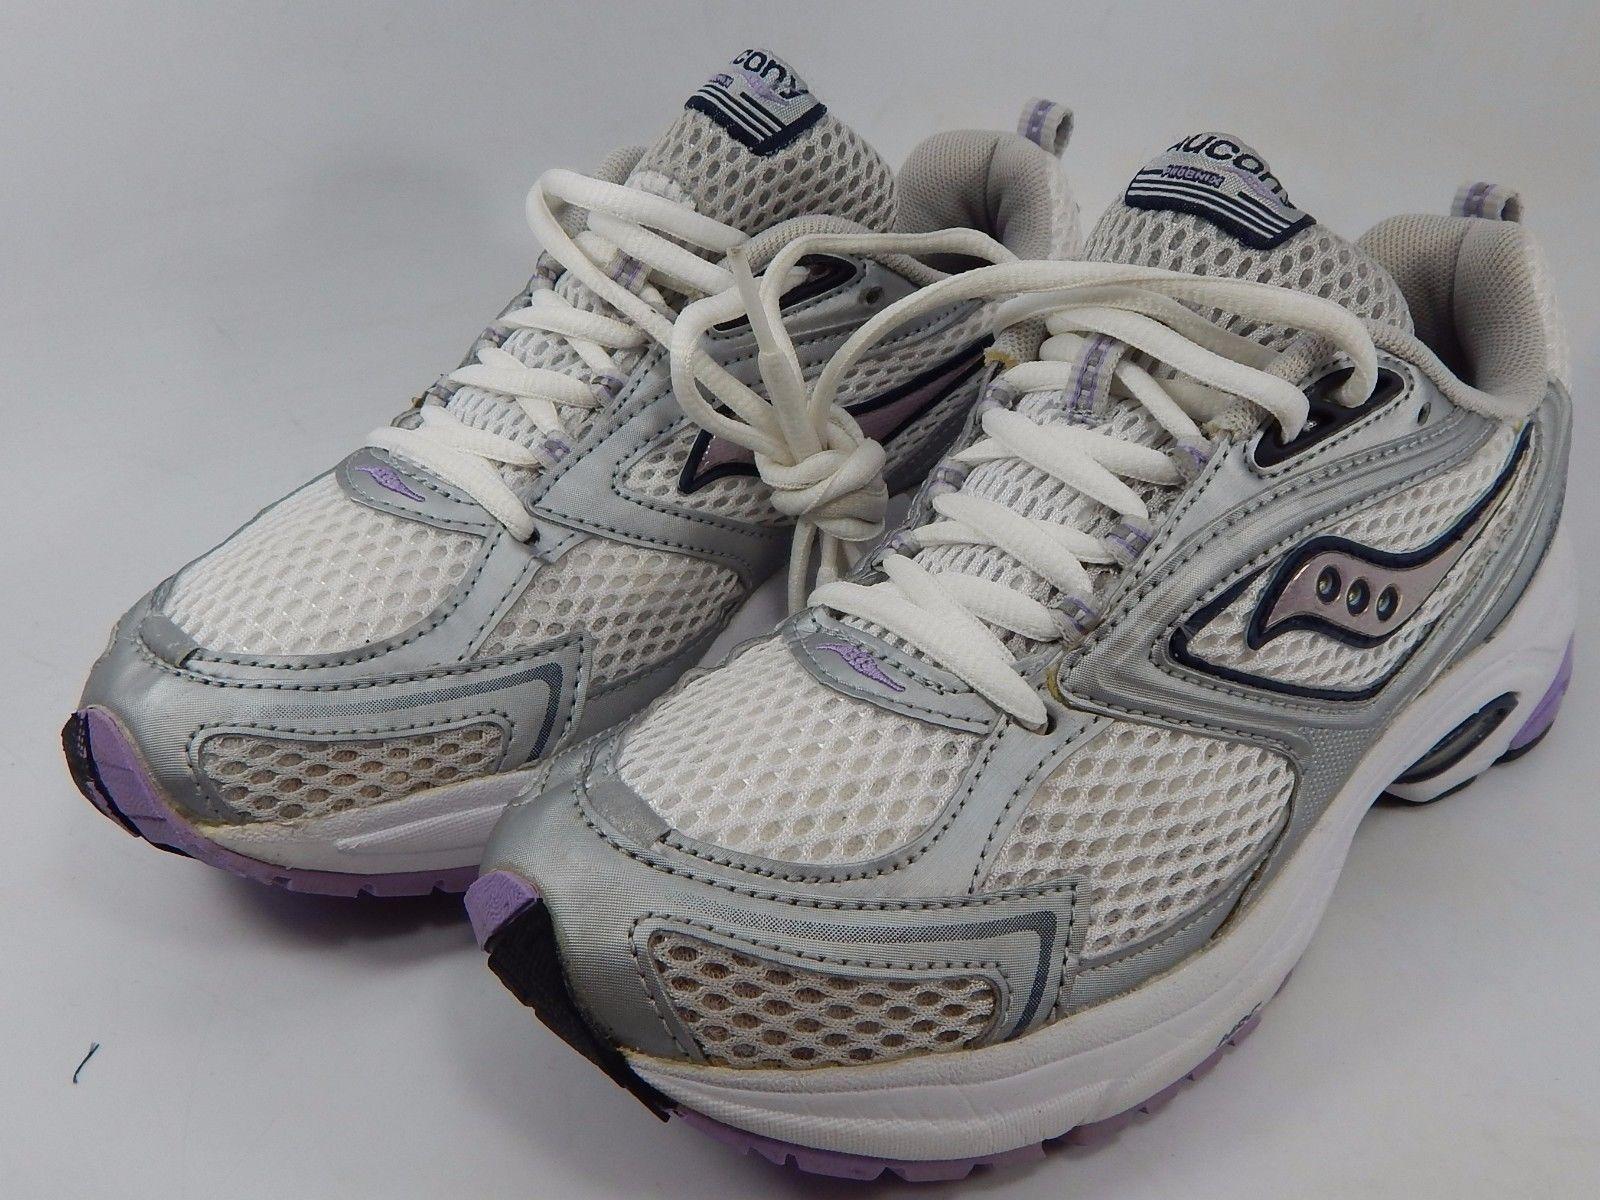 Saucony Phoenix Women's Running Shoes Size US 6.5 M (B) EU 37.5 White 1819-1